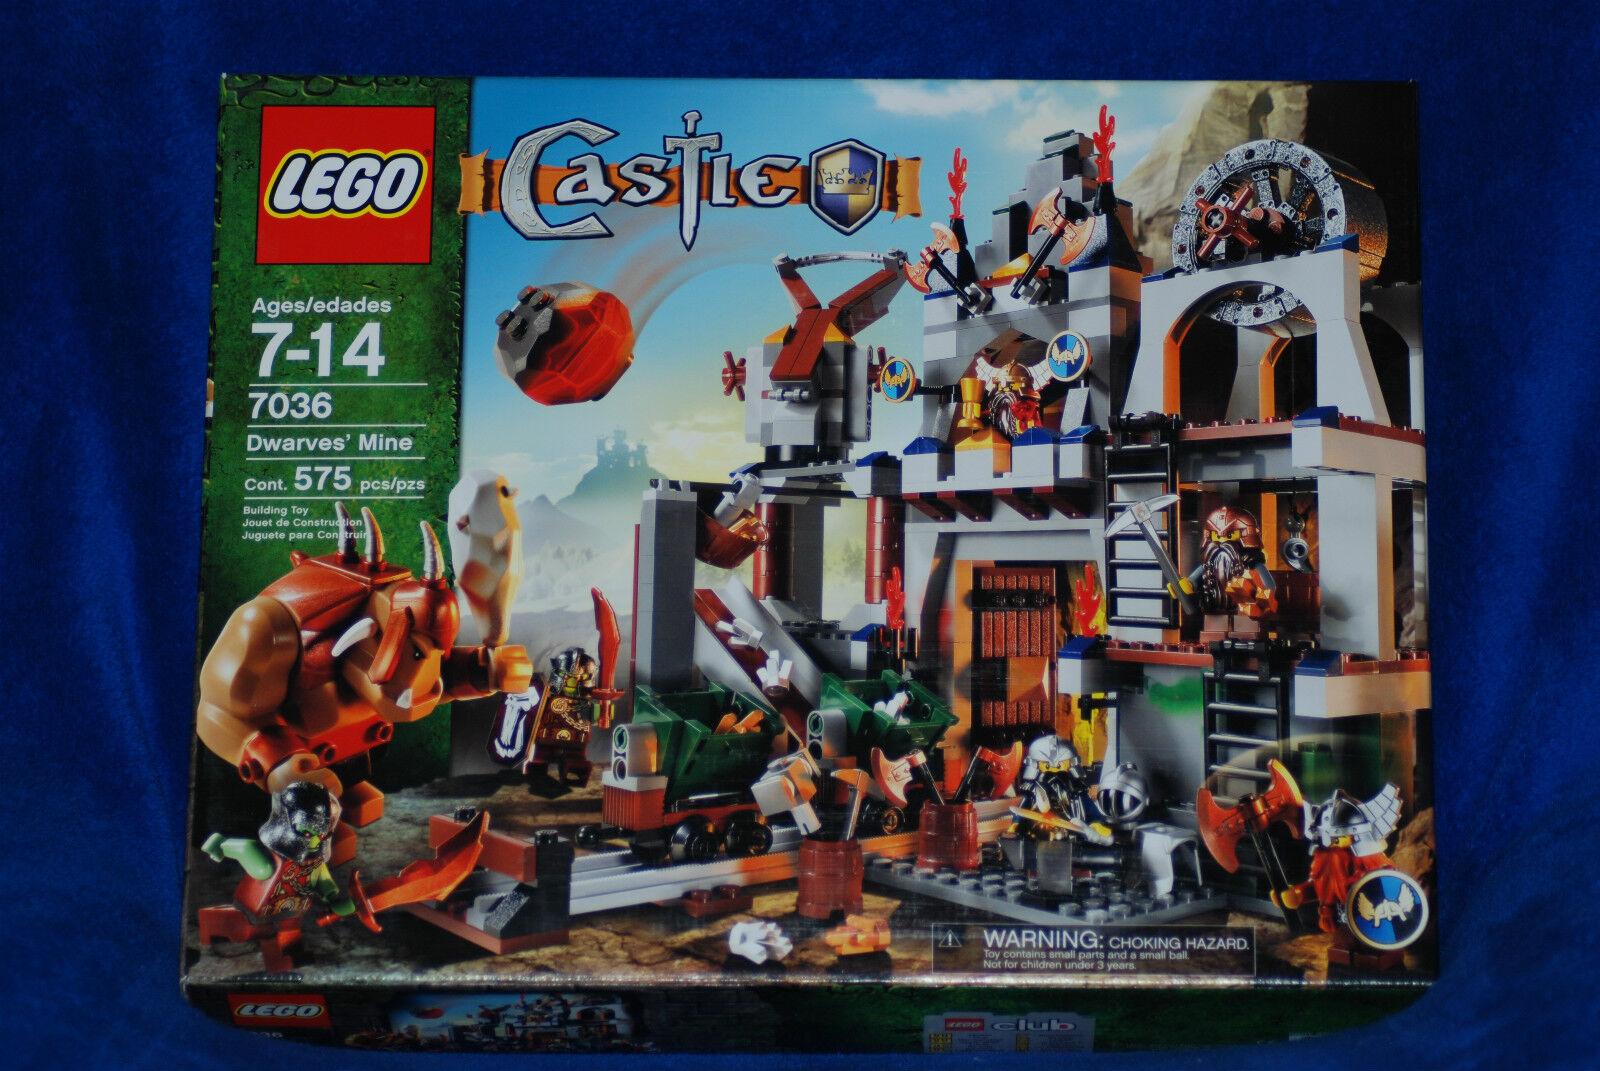 Mine 7036 Nnekhv6919 Lot Dwarves' Misb Lego Bau New Castle c1lKT3FJ